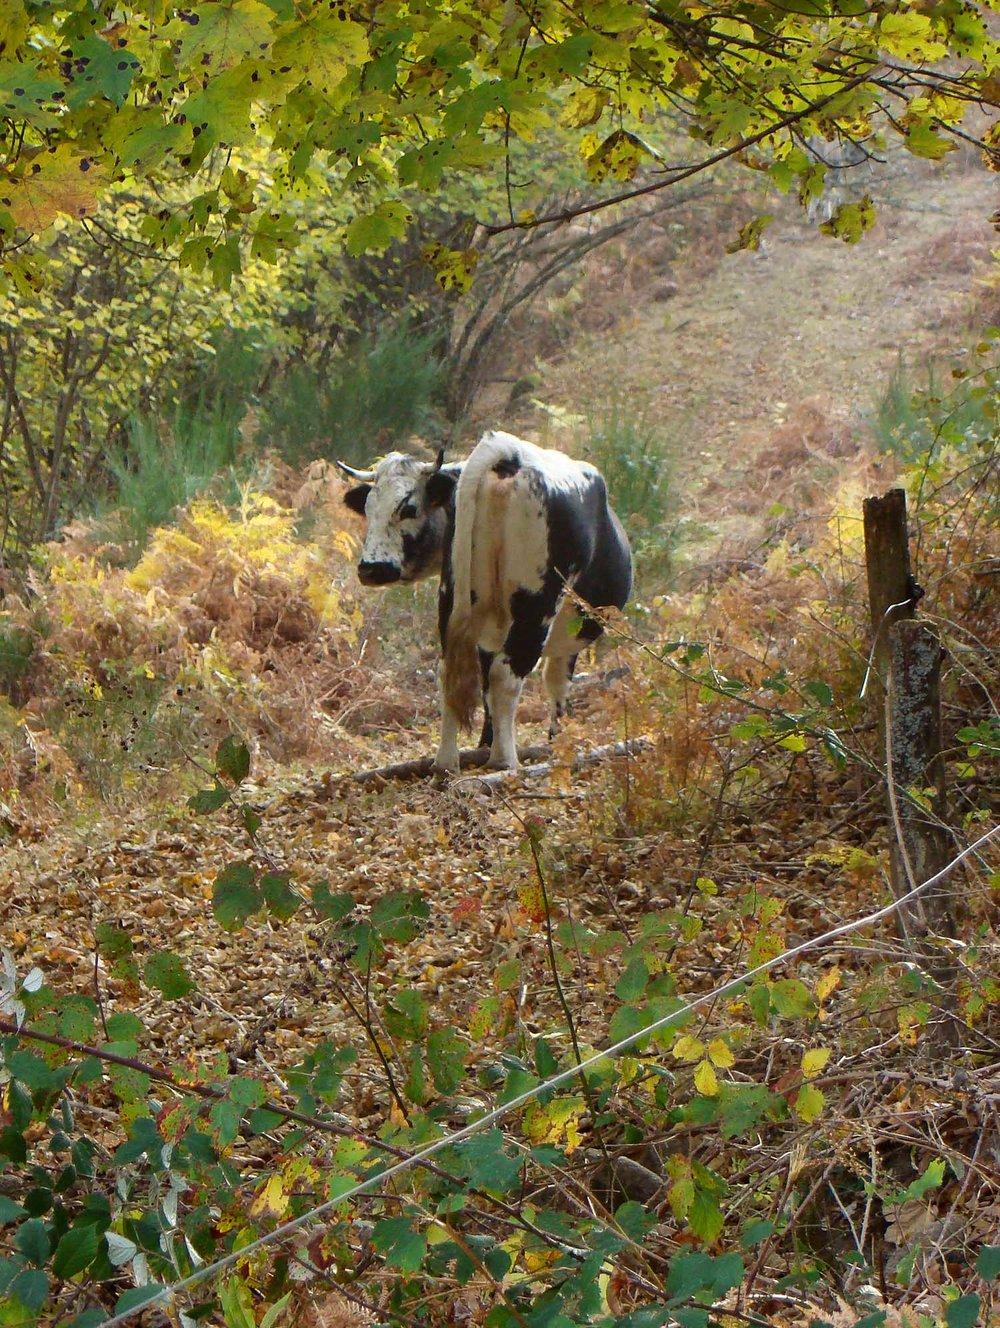 Cow_in_brambles.jpg